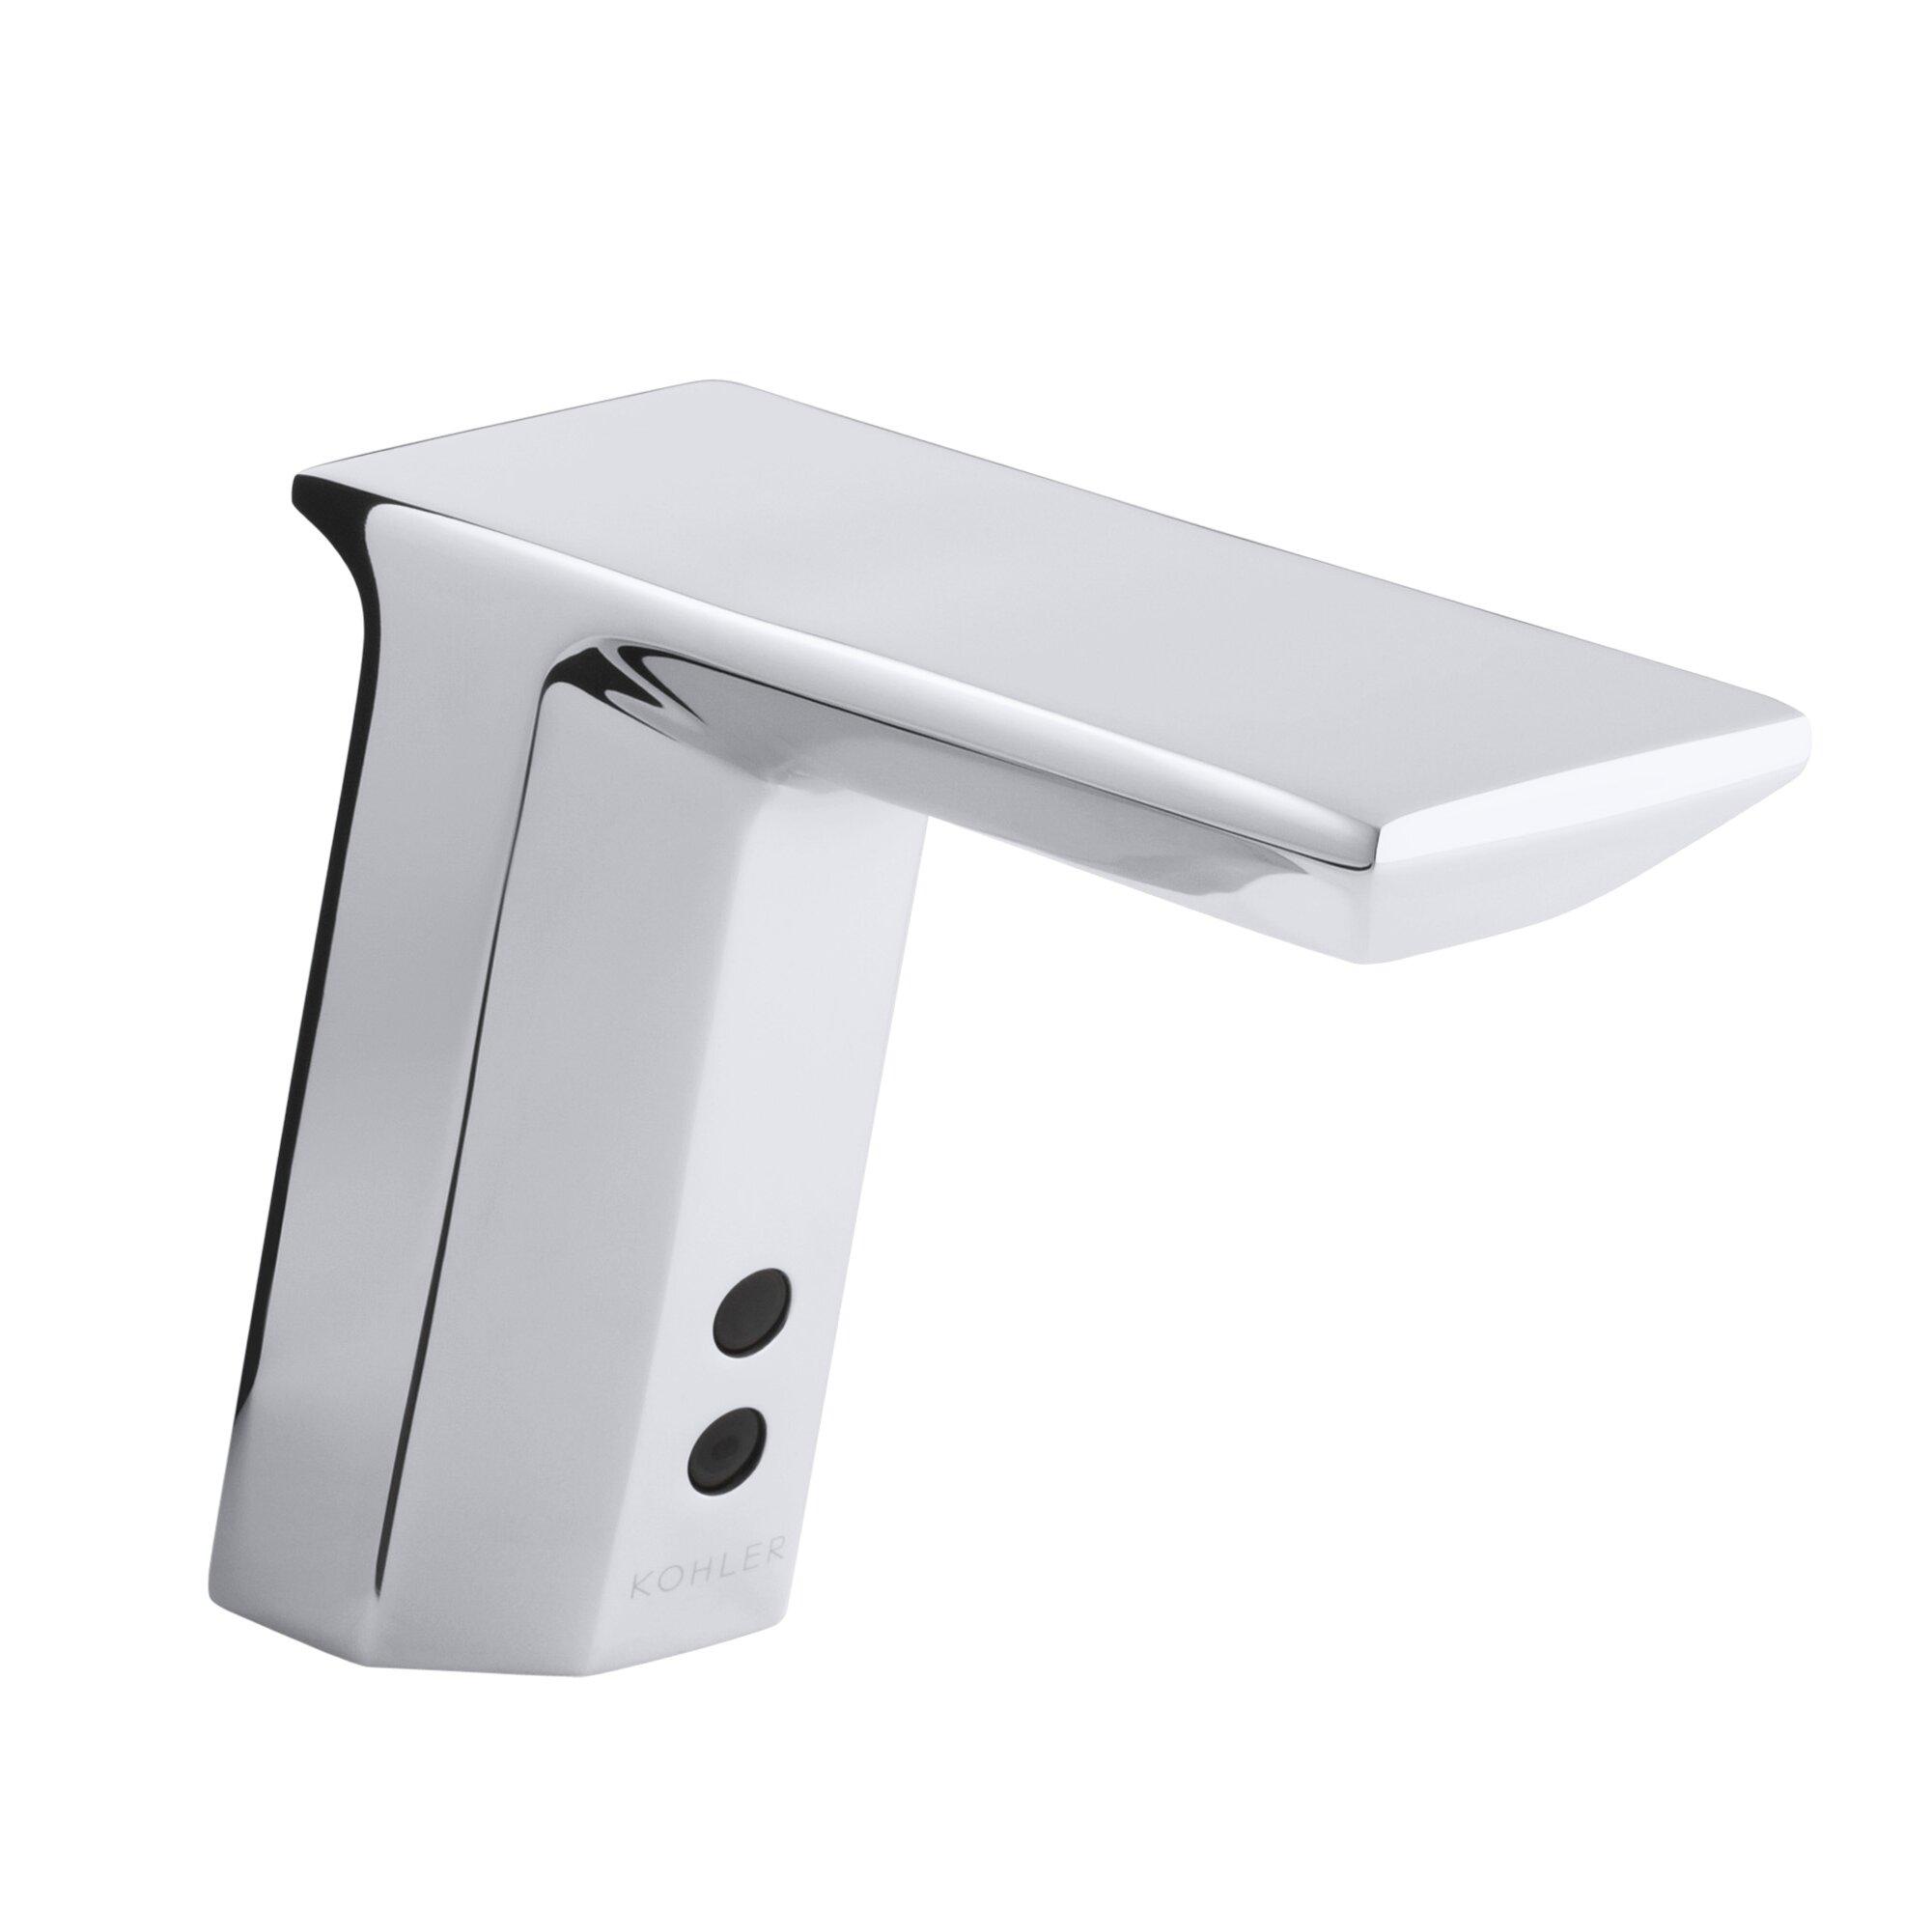 ... Improvement Bathroom Fixtures ... Kohler Part #: K-13468 SKU: KOH15125